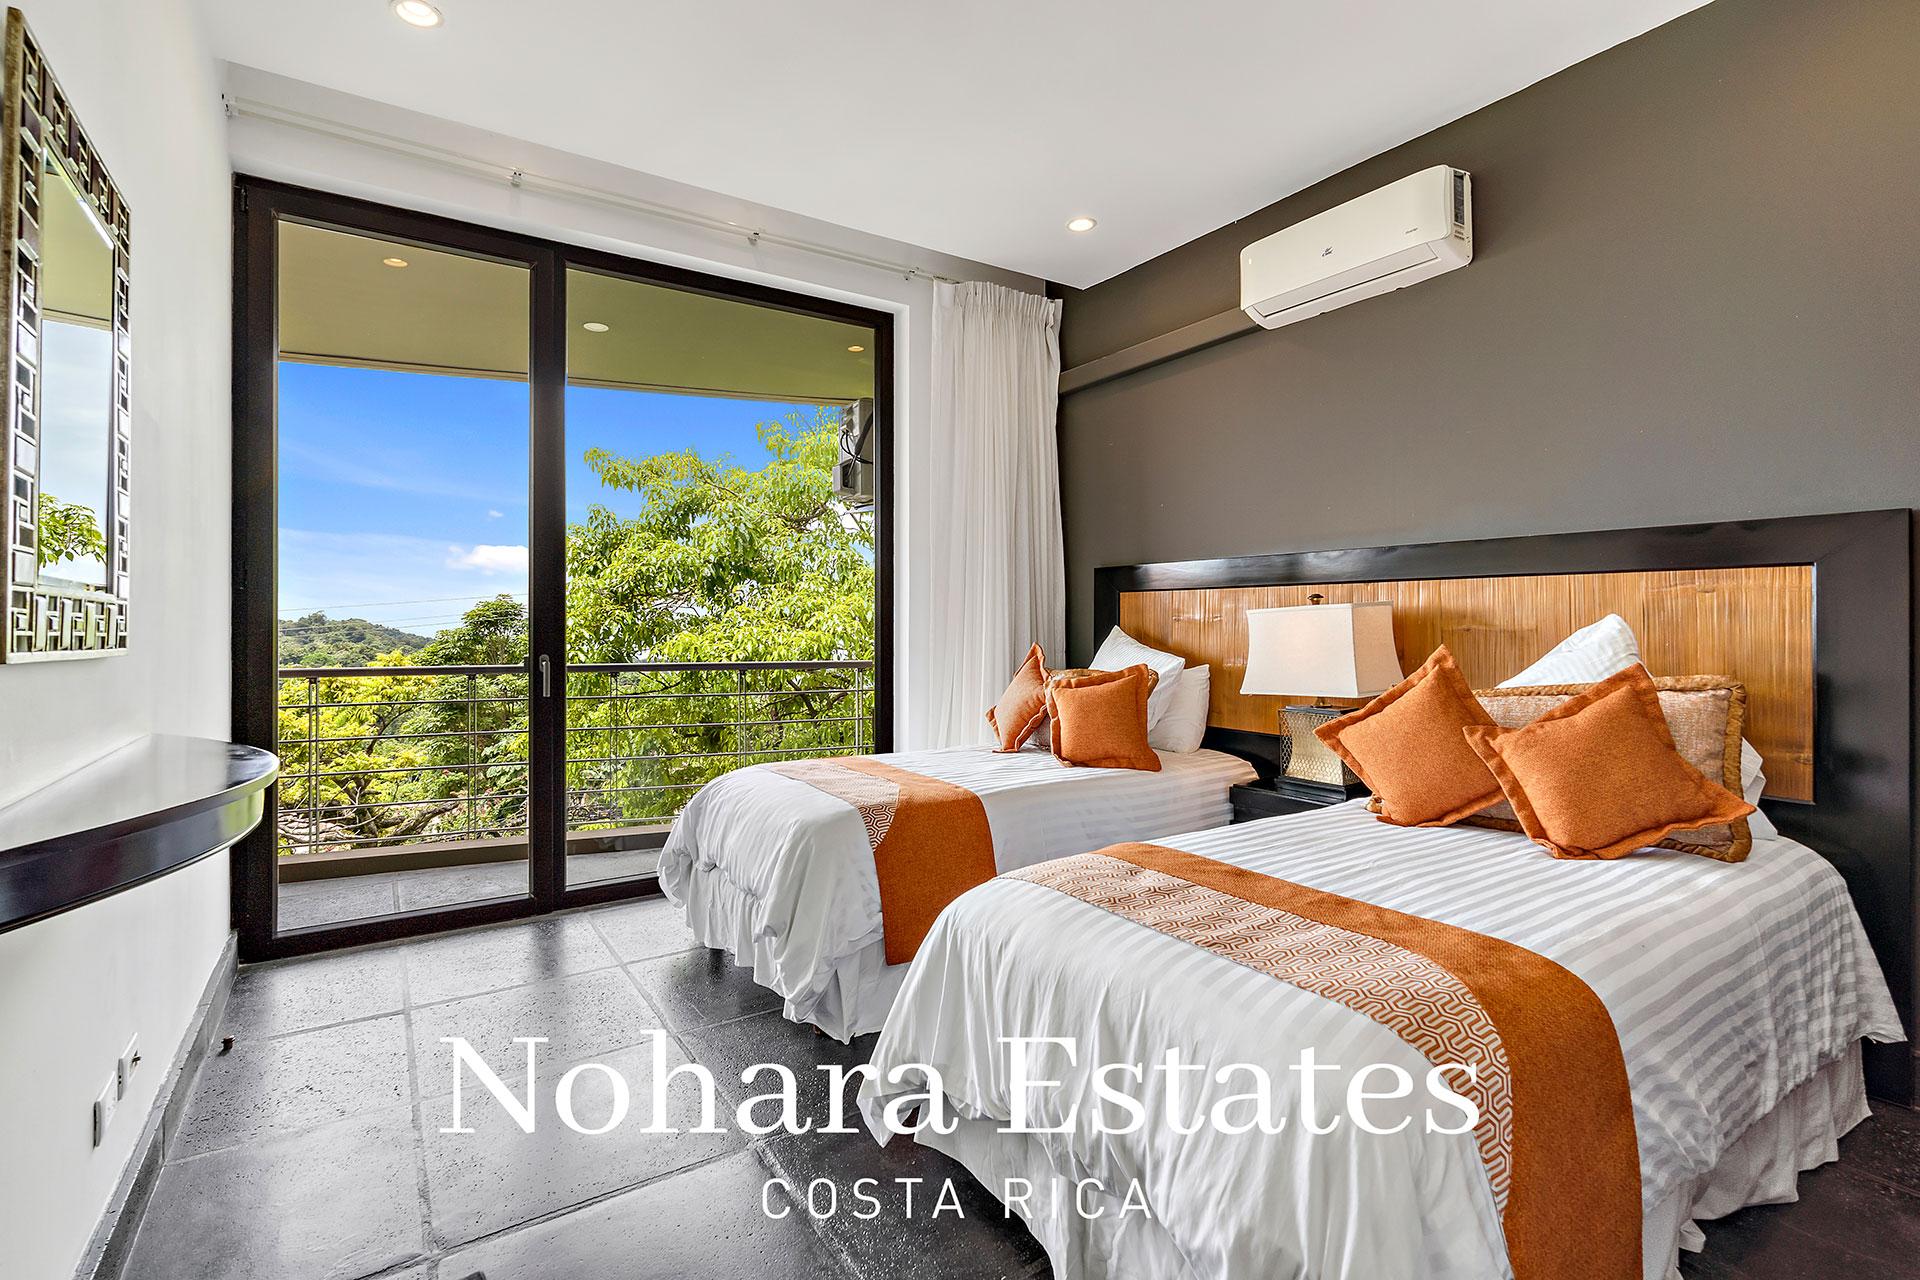 Nohara Estates Costa Rica 122 Apartment Quepos Los Altos 16